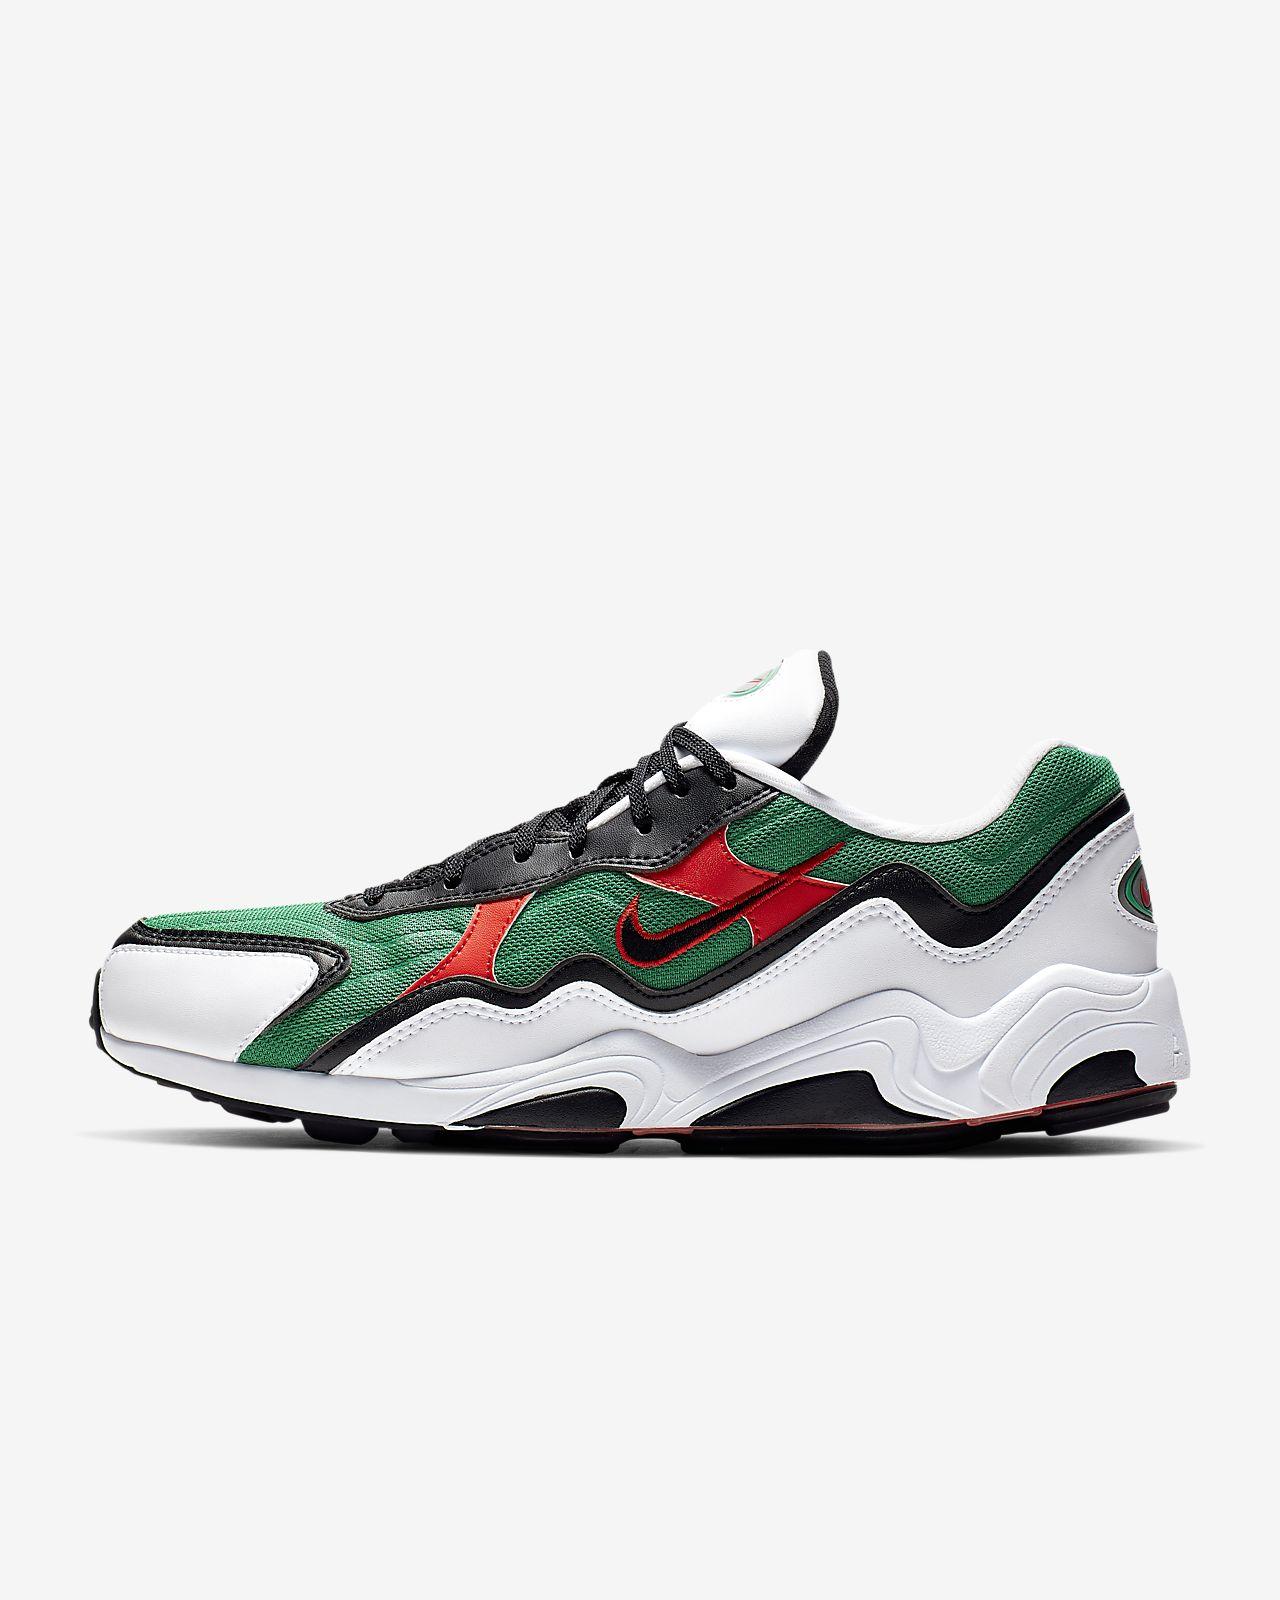 quality design 96a06 e83f4 ... Chaussure Nike Air Zoom Alpha pour Homme